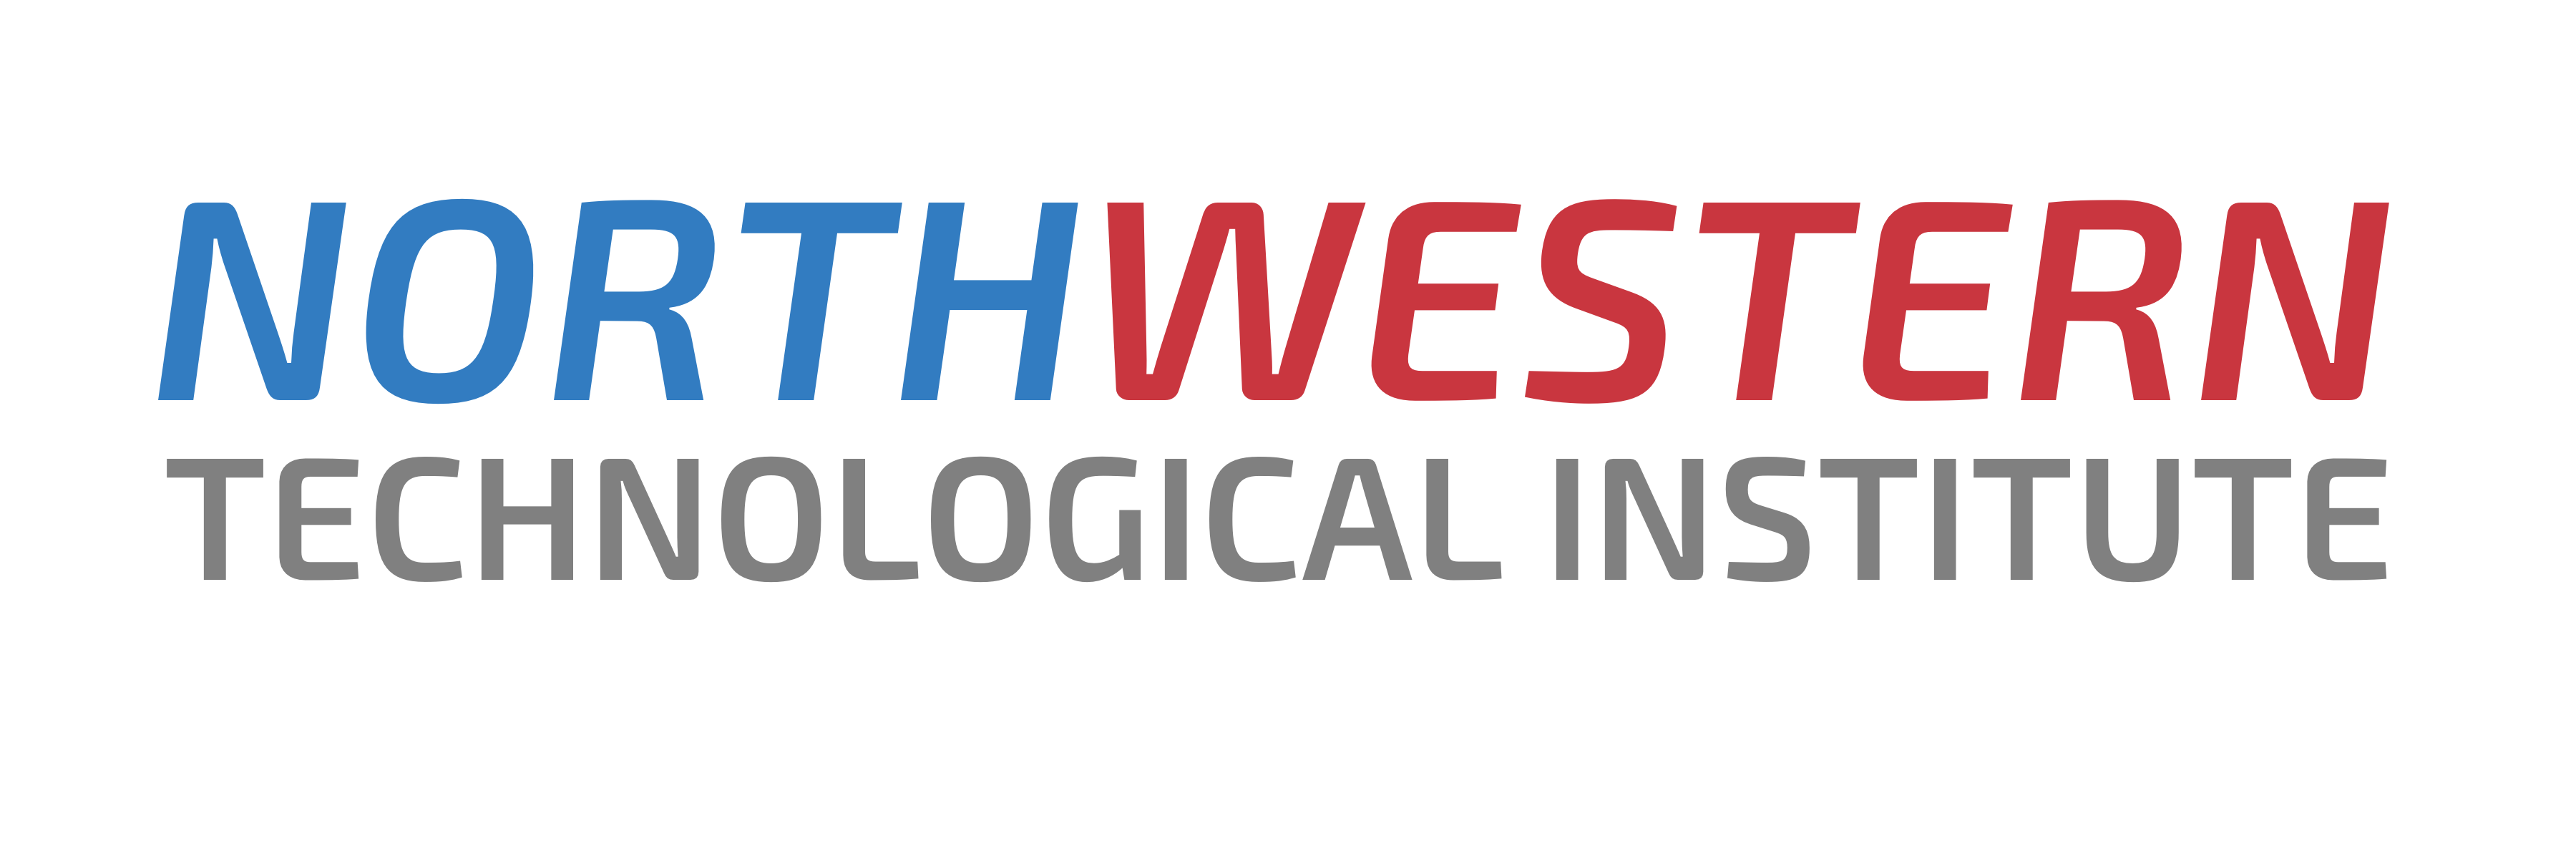 Northwestern Technological Institute